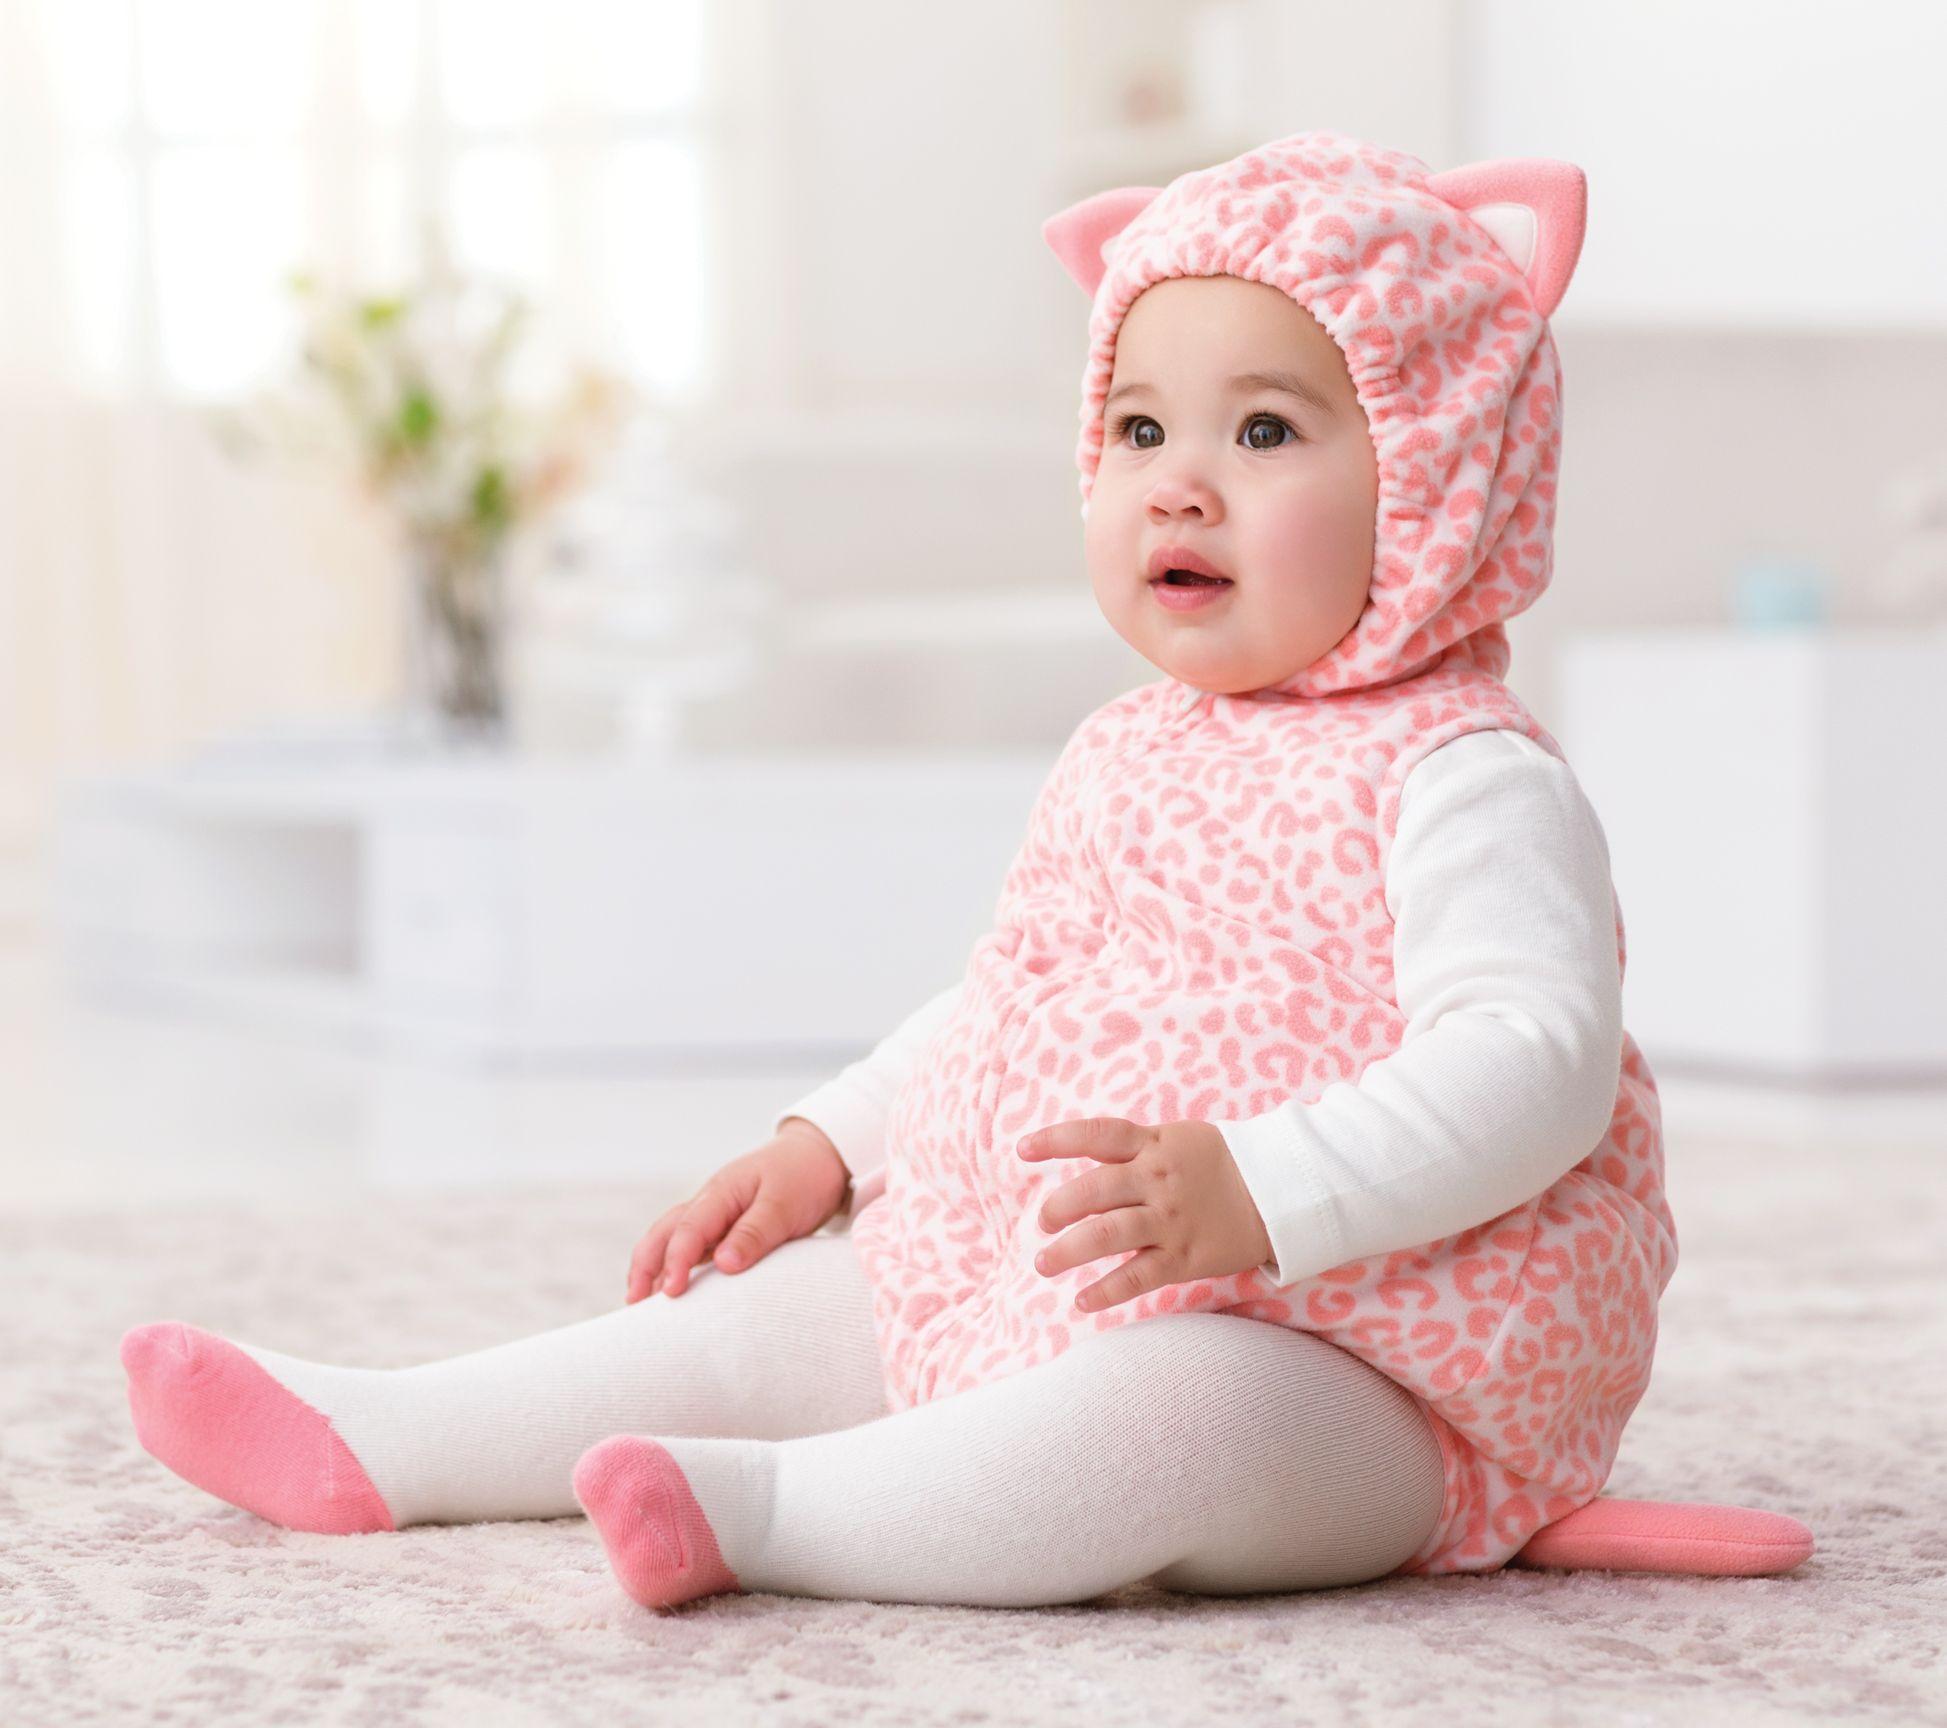 Little Cat Baby Halloween Costume #beallsflorida  sc 1 st  Pinterest & Little Cat Baby Halloween Costume #beallsflorida | Kids Dress and ...